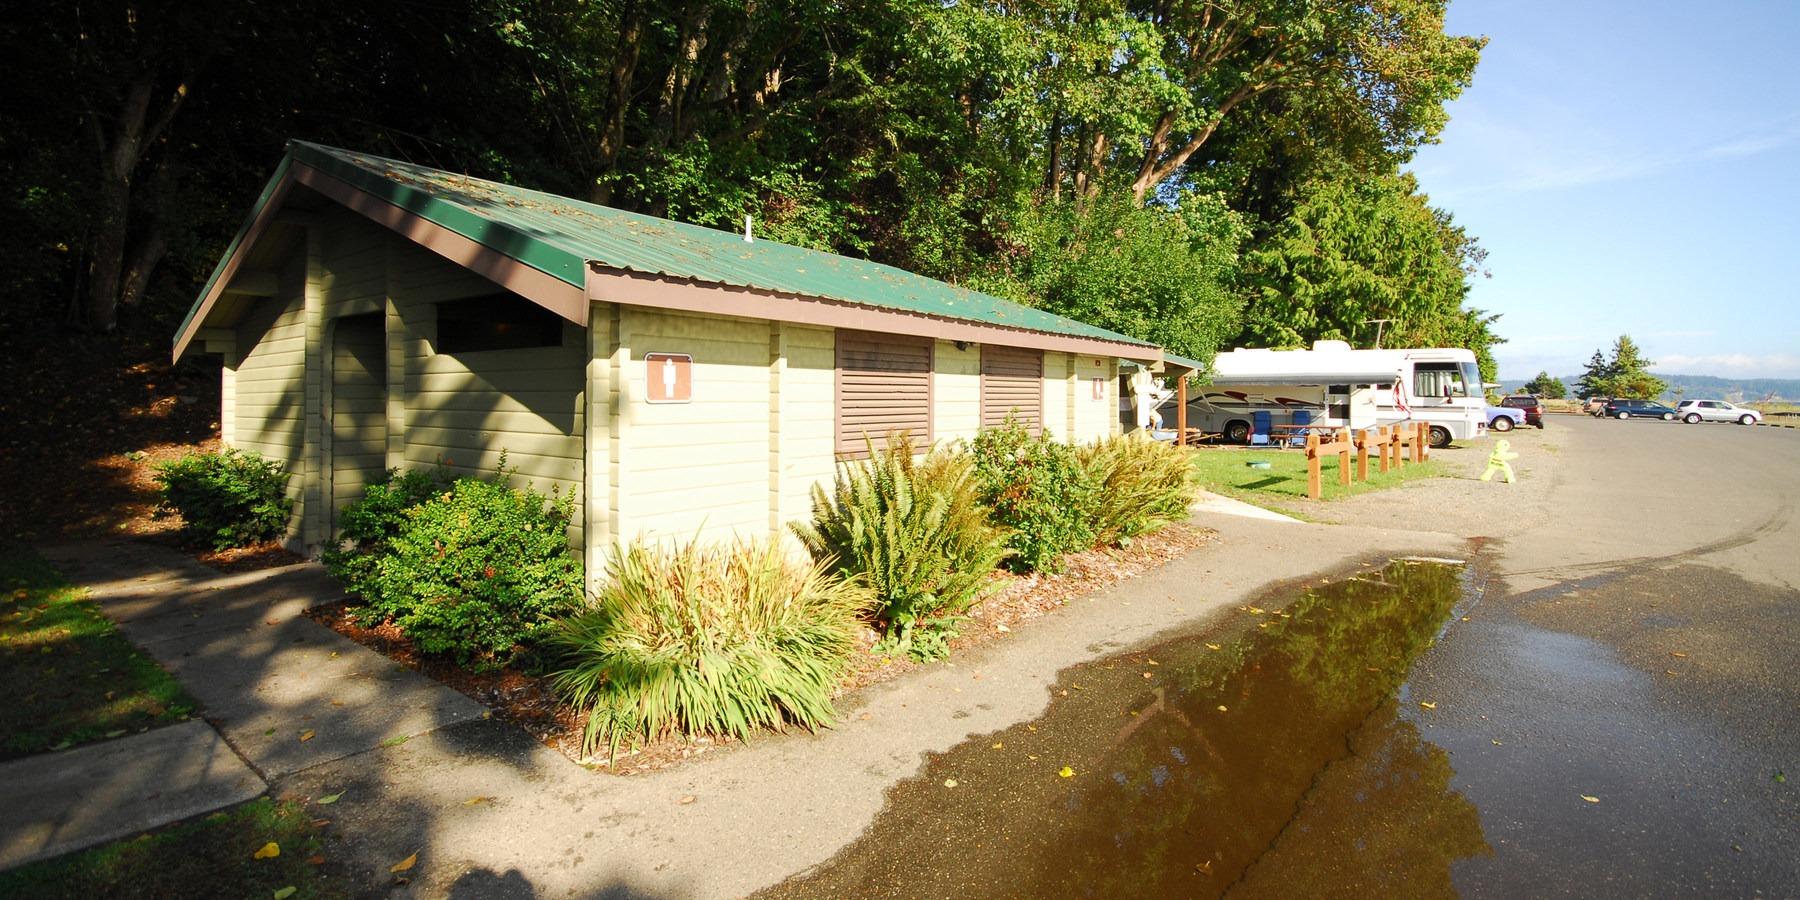 Fay Bainbridge Park Campground Outdoor Project